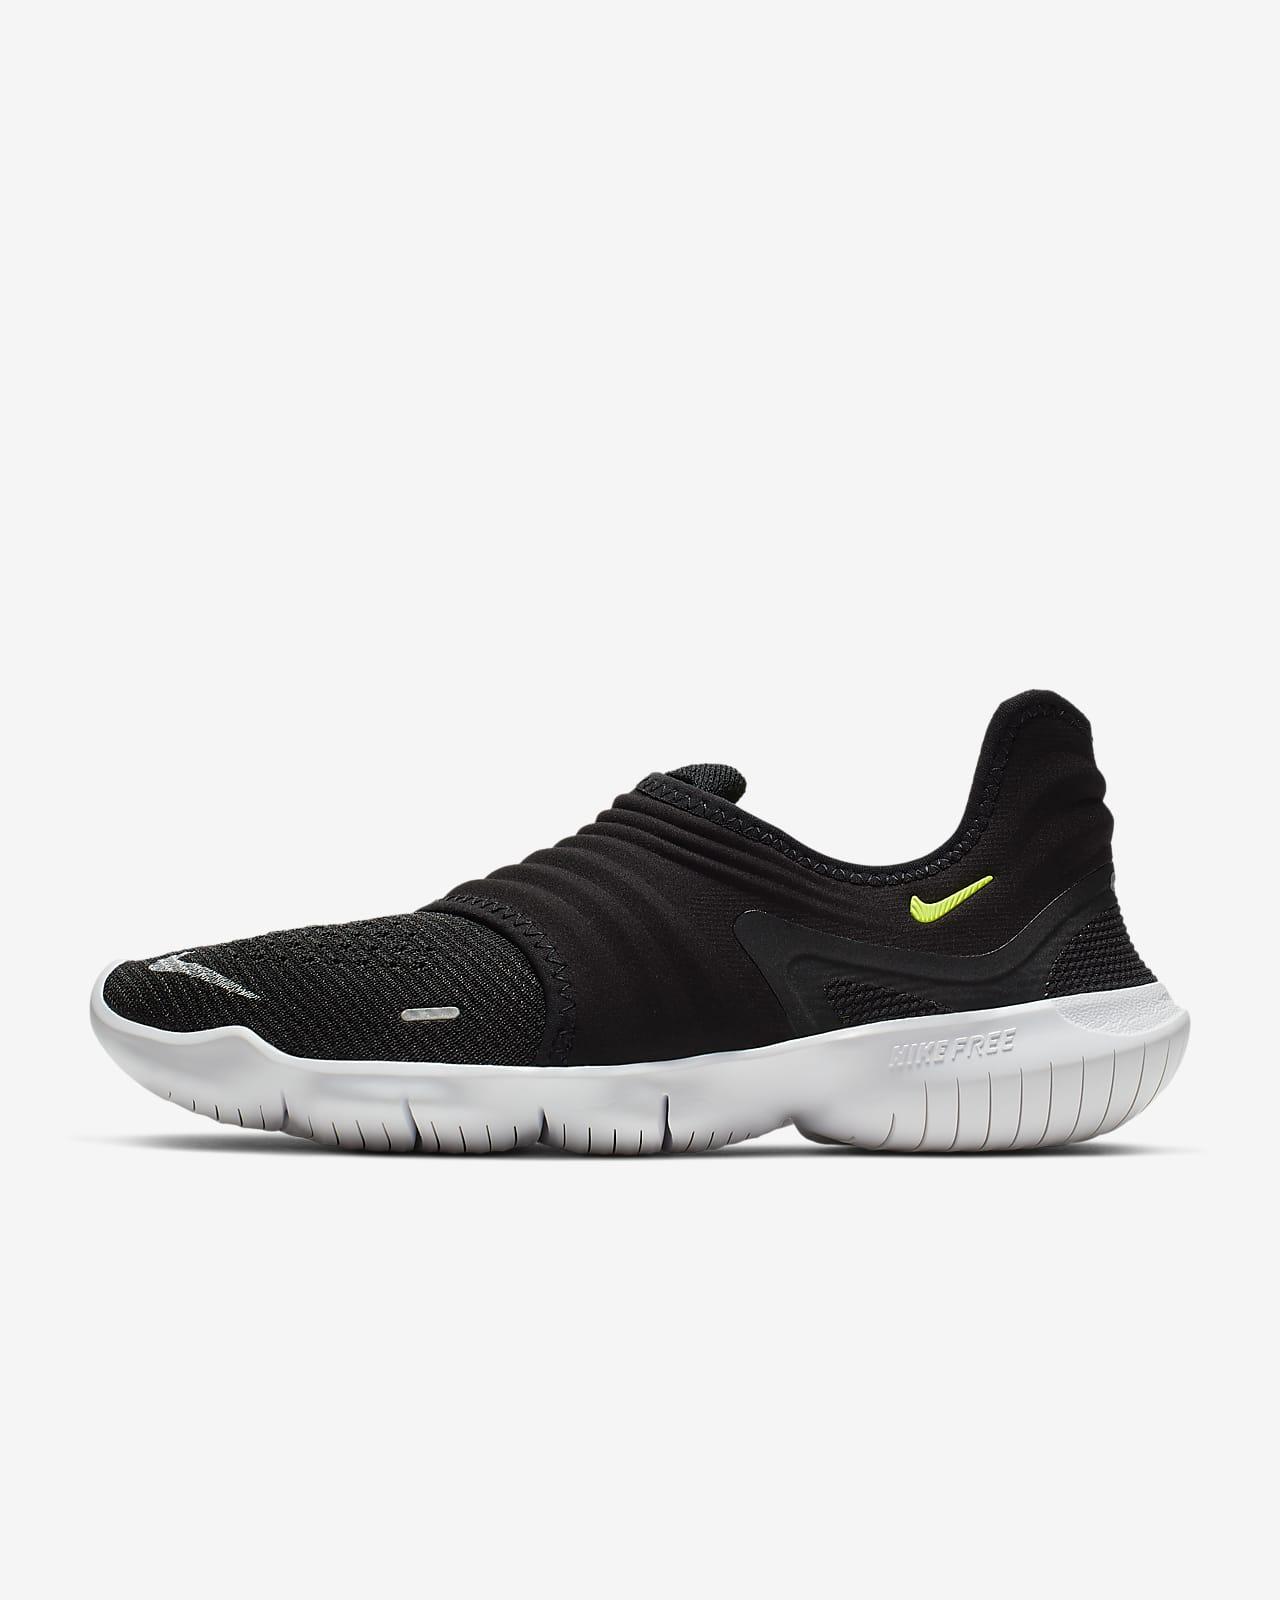 nike rn running shoes womens